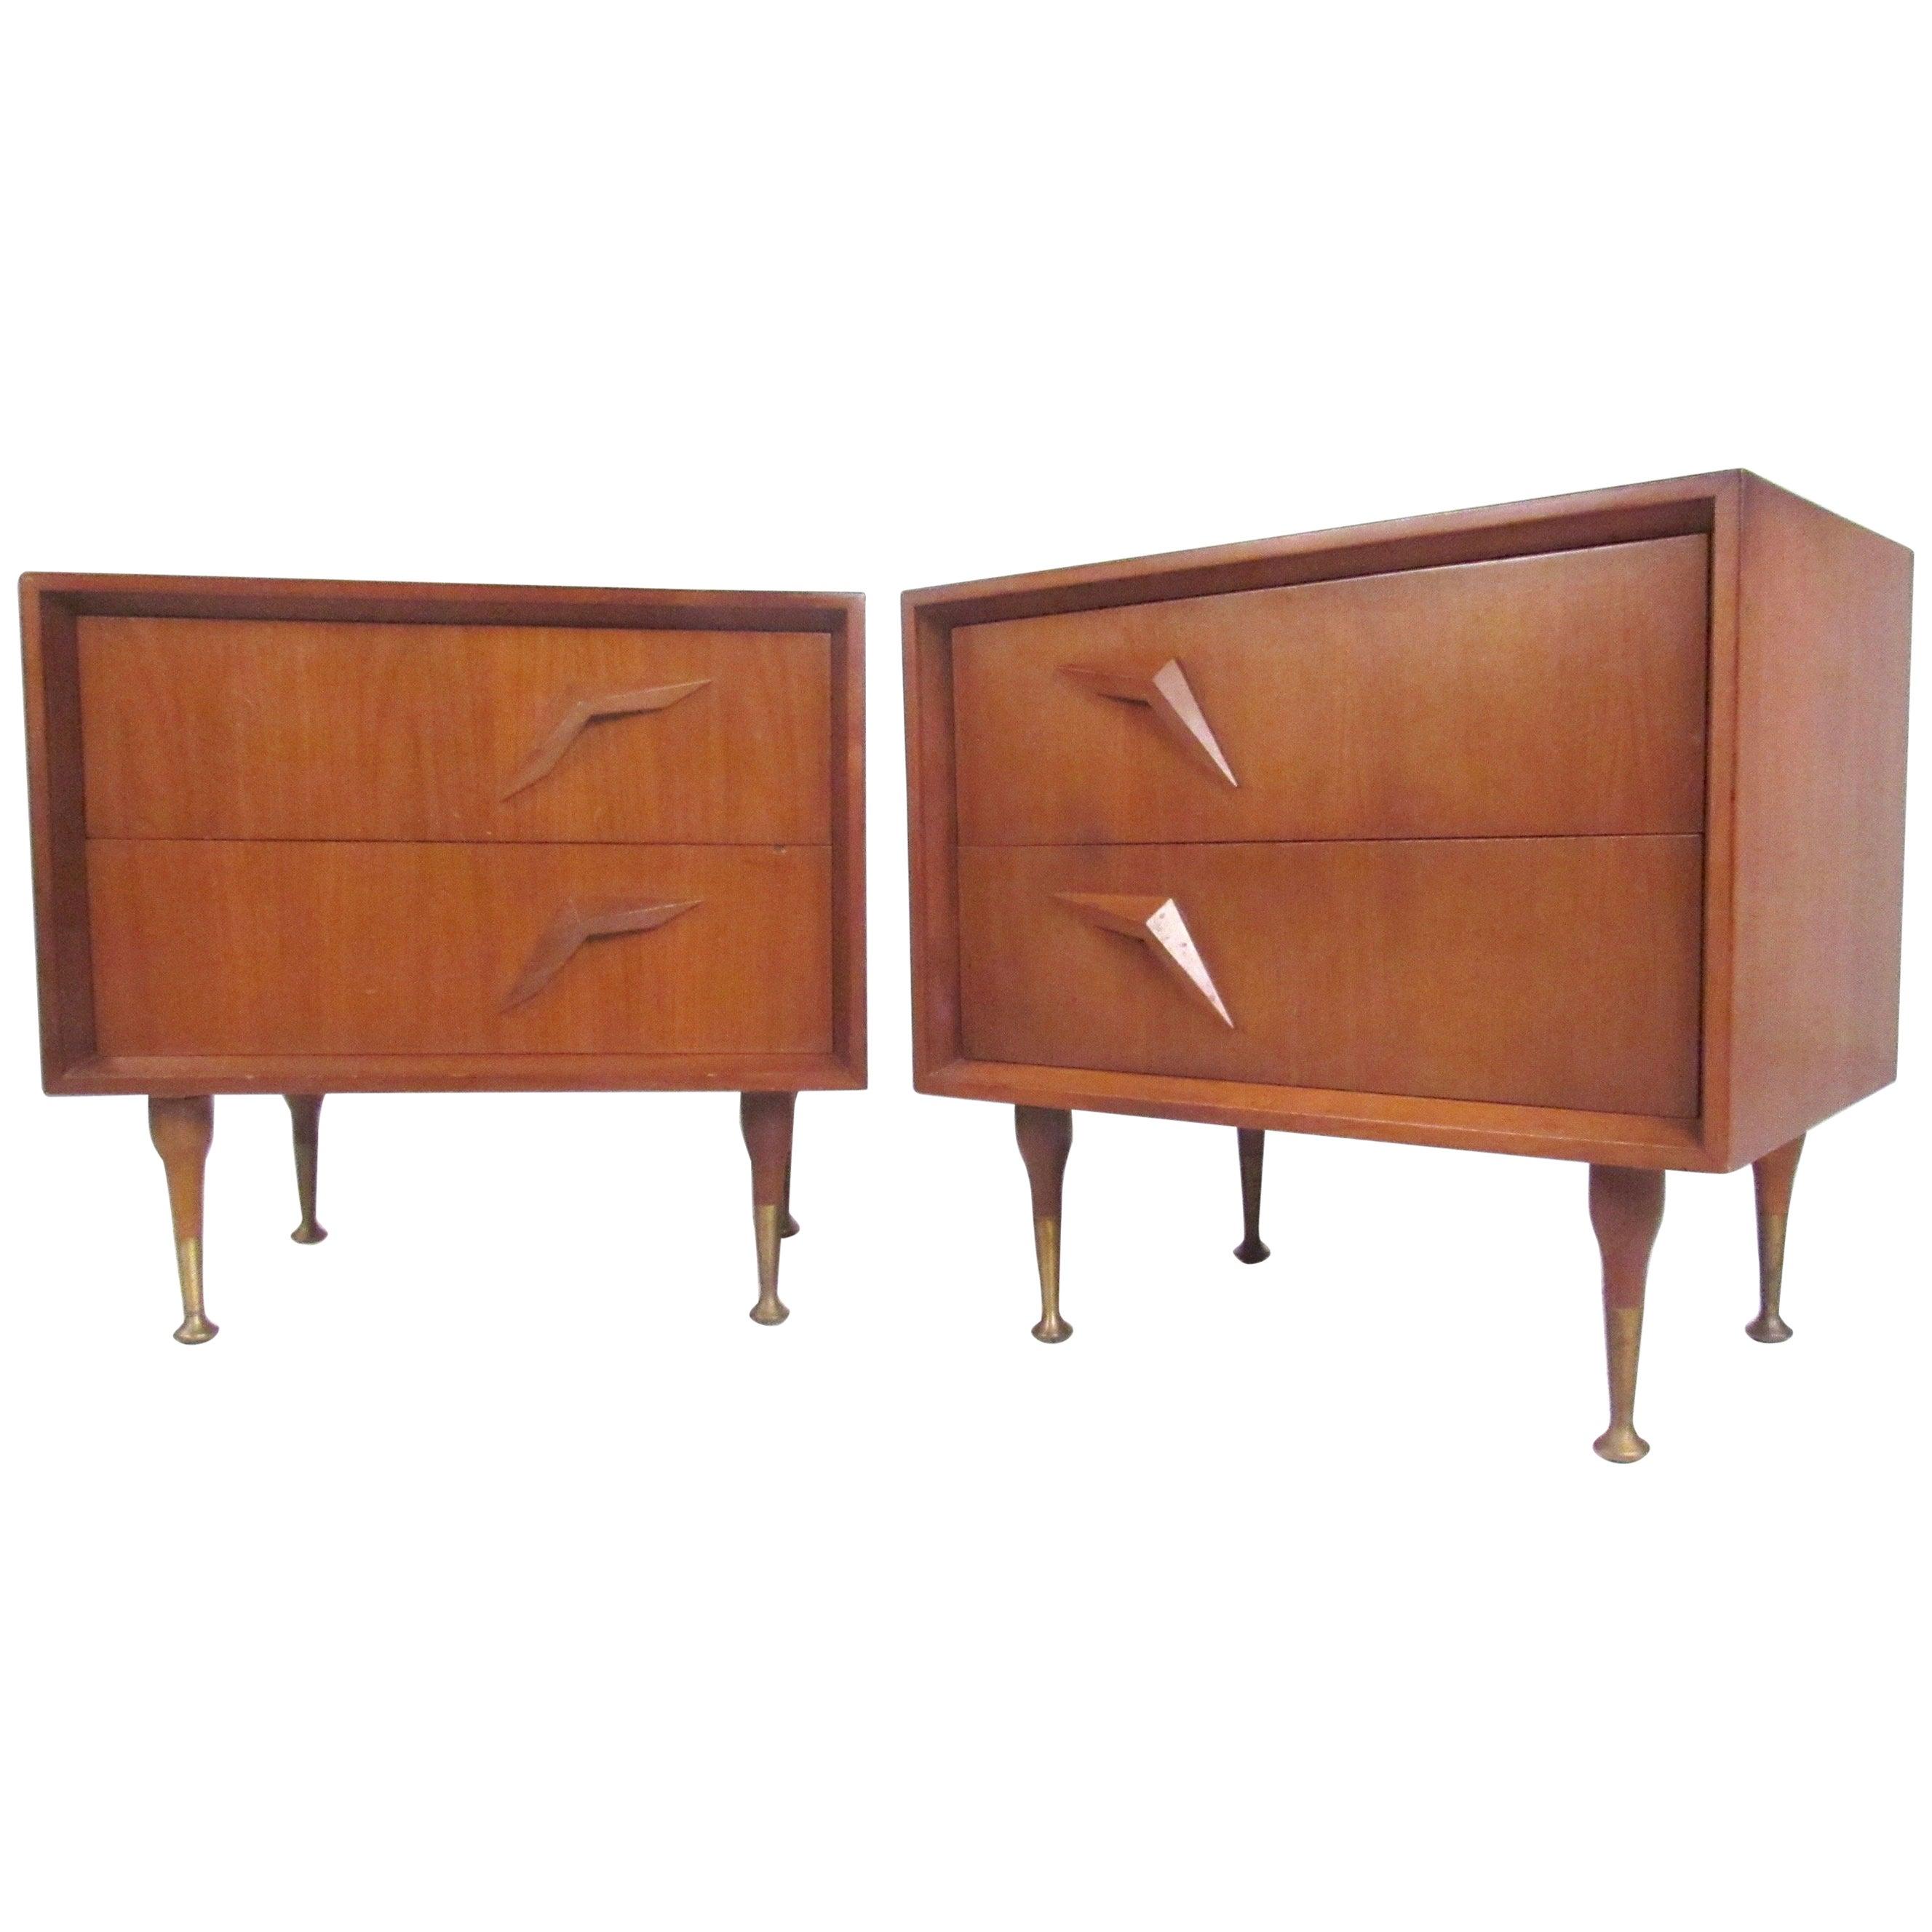 Pair of Stunning Vintage Modern Walnut Nightstands